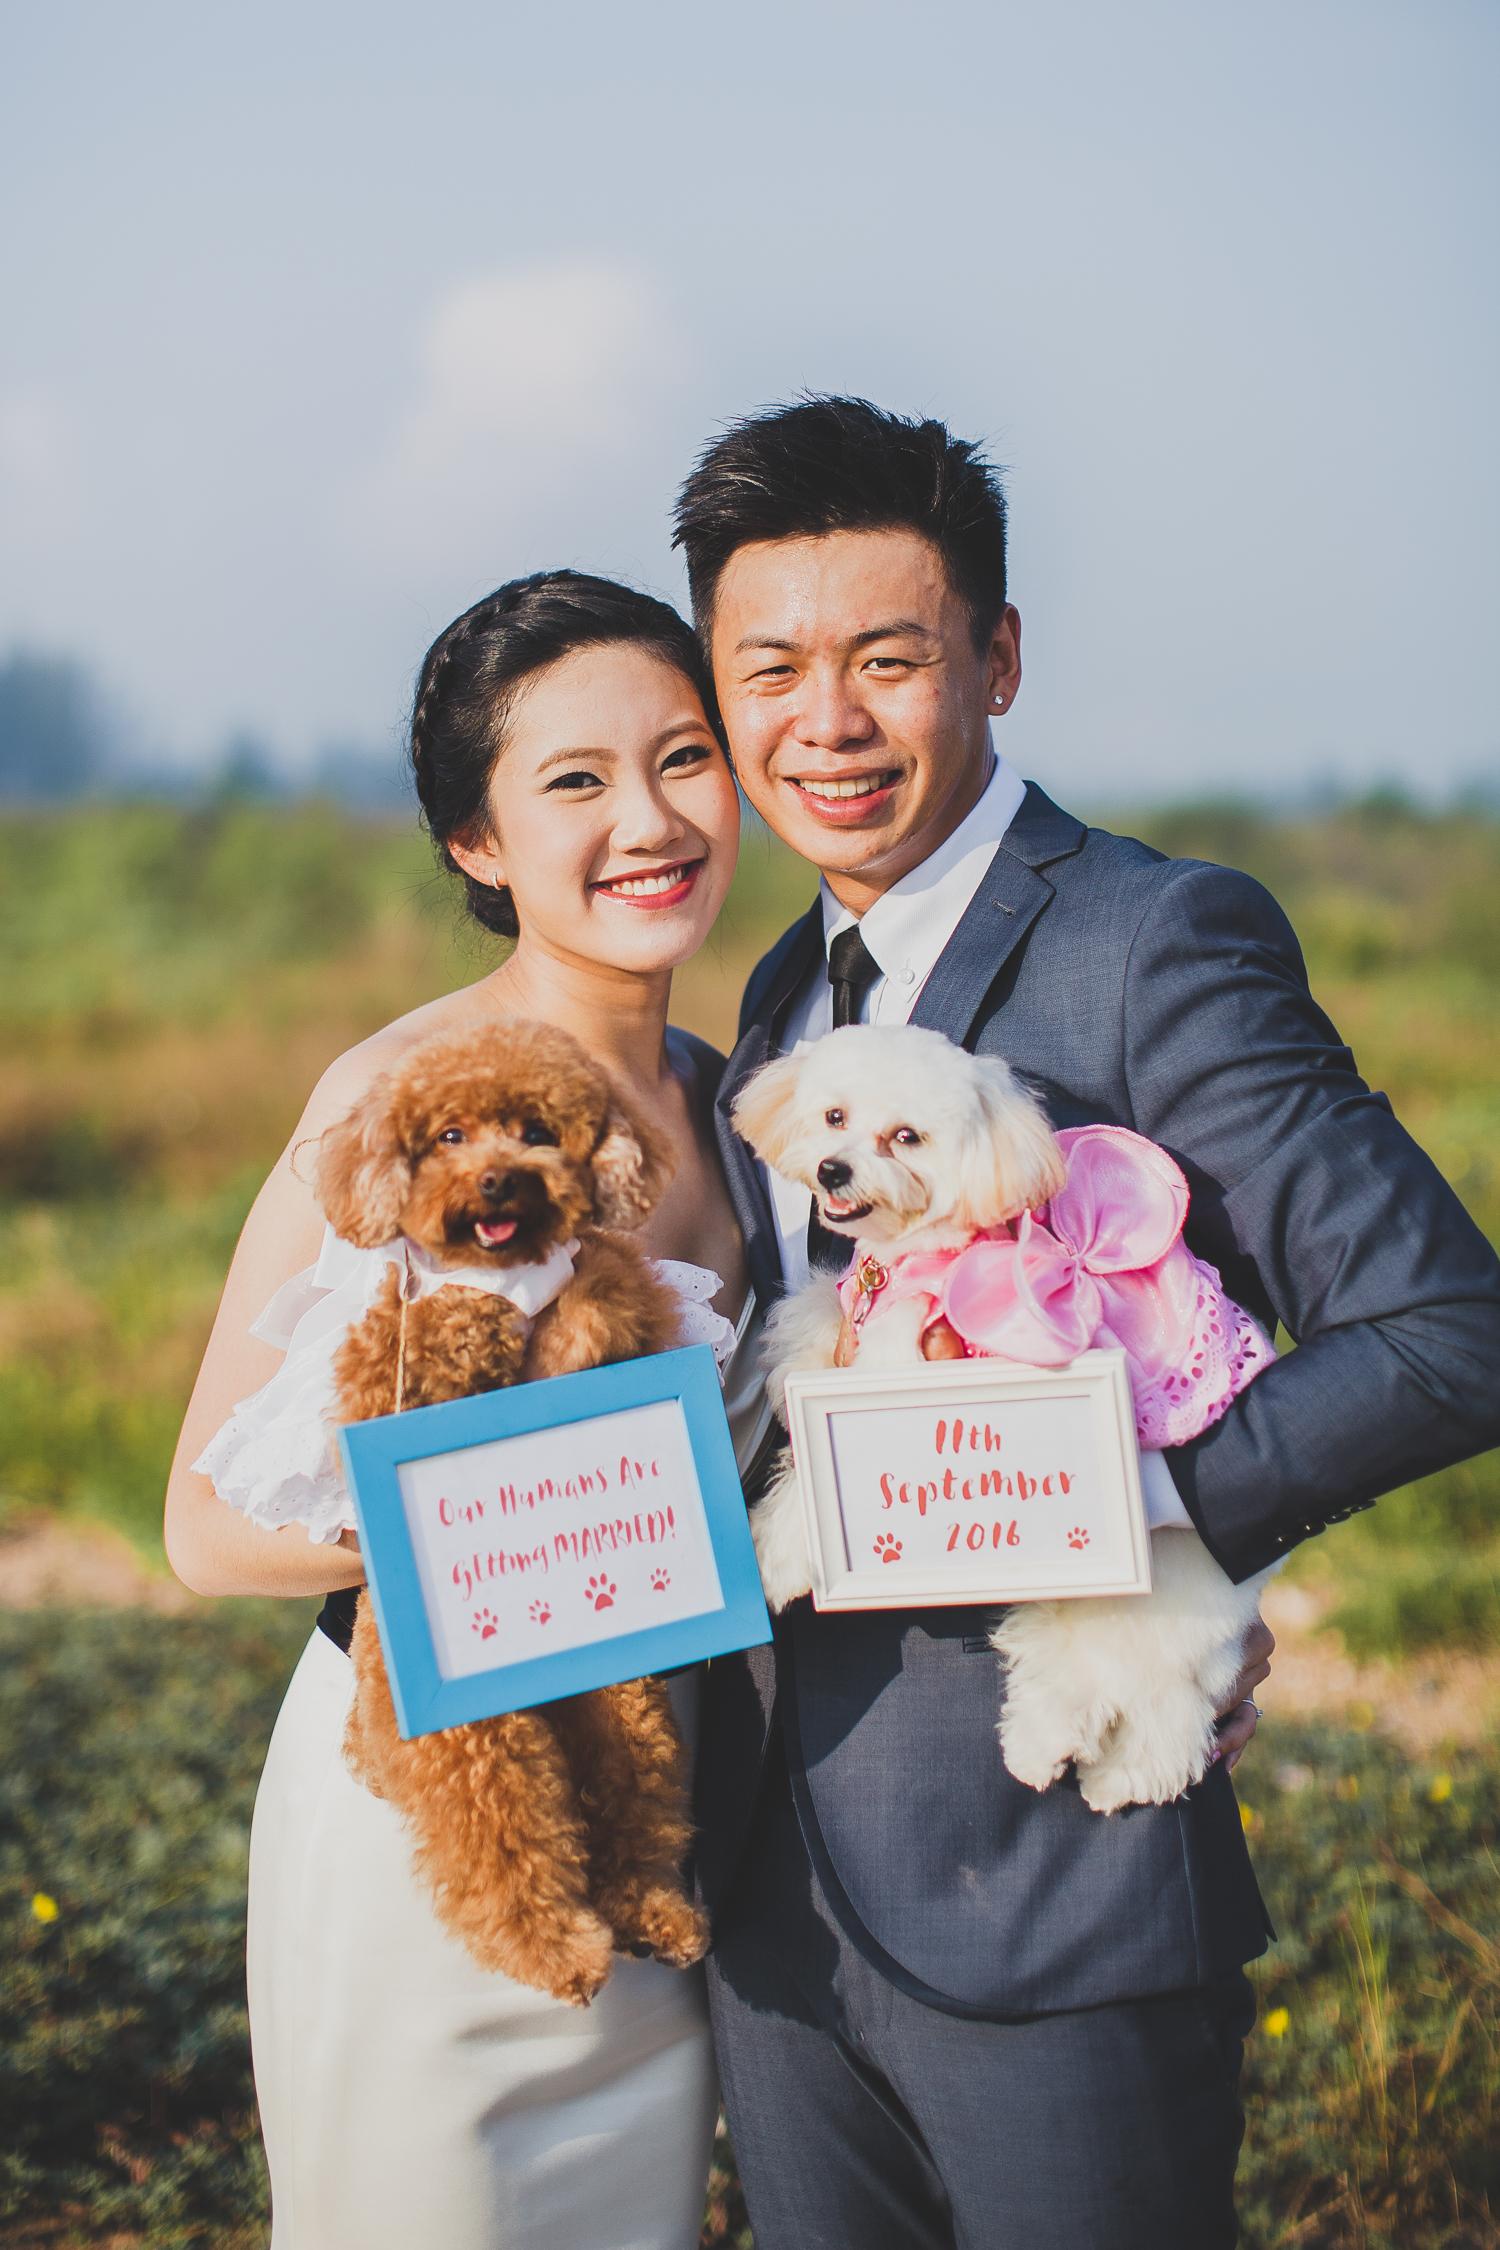 Singapore+Pre+Wedding+Photographer+Ziyang+Clara-0011.jpg